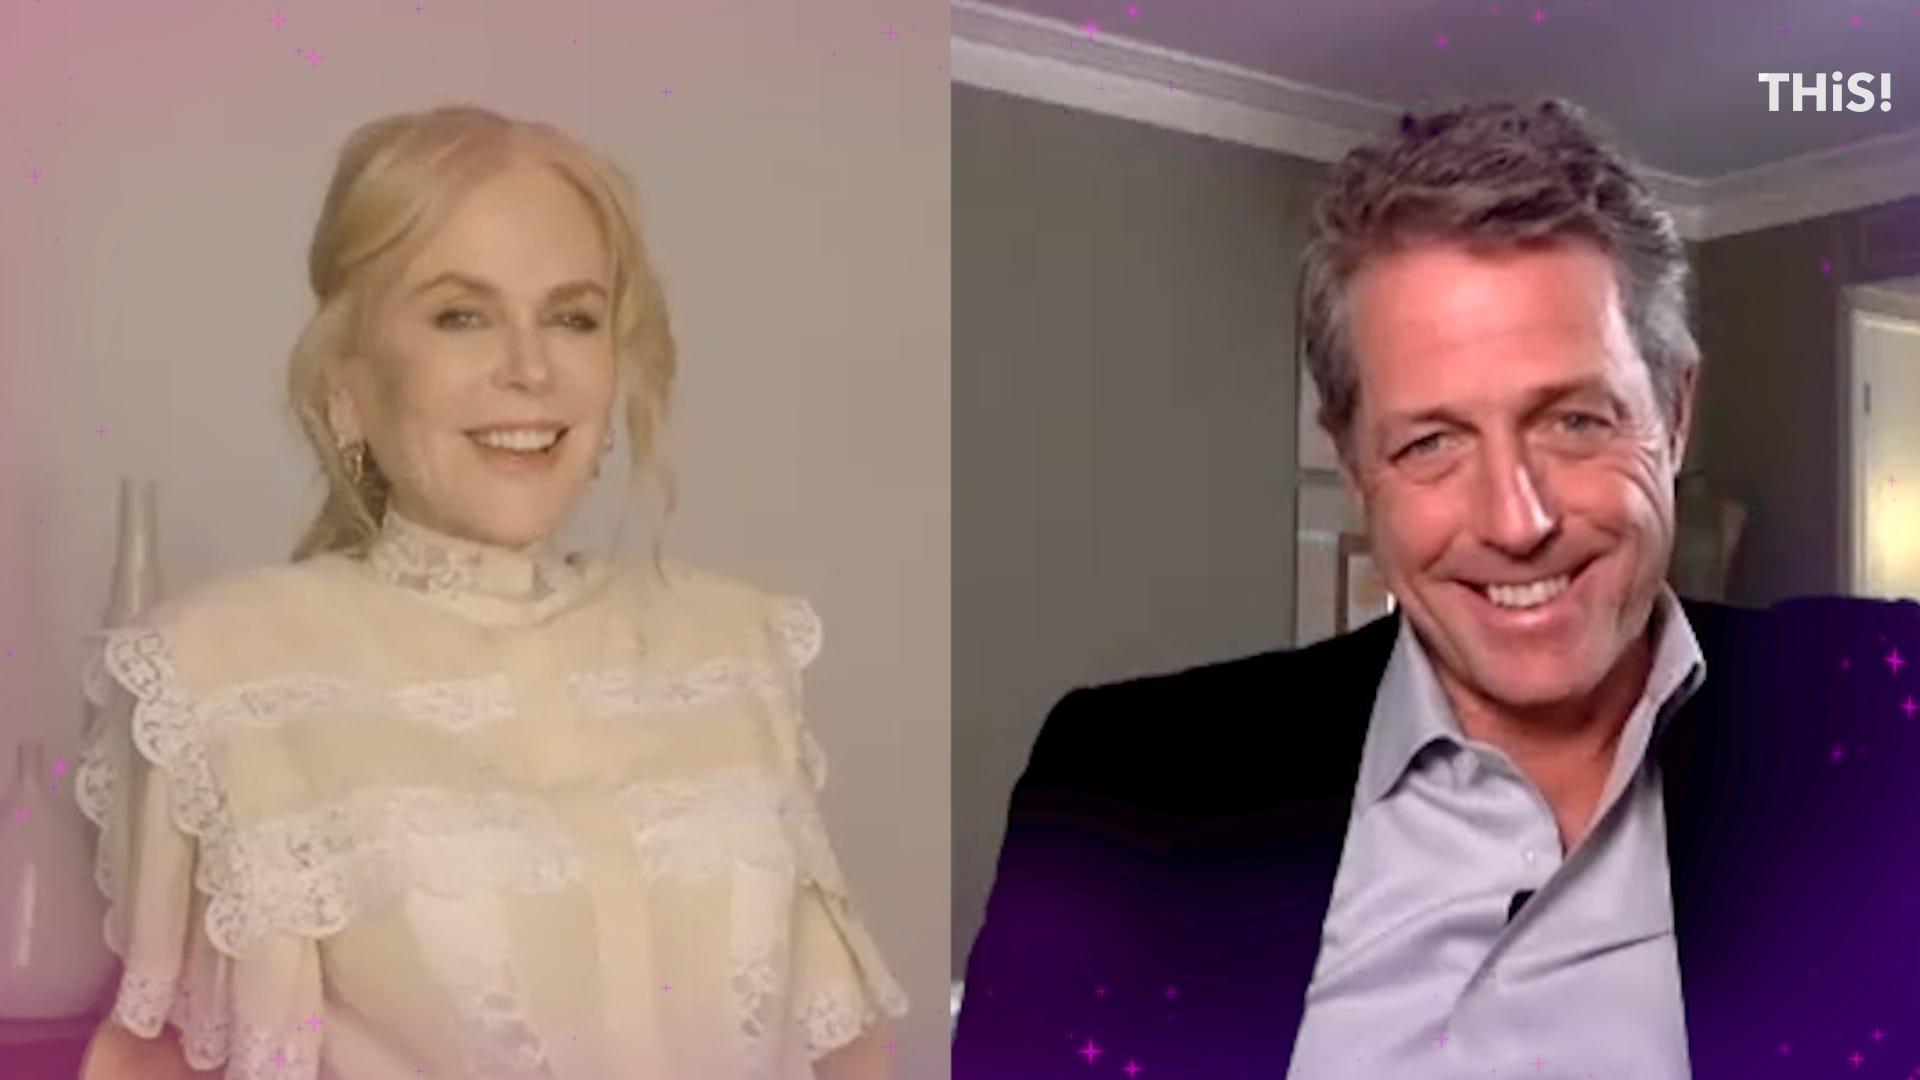 Nicole Kidman and Hugh Grant talk friendship, new HBO series 'The Undoing'